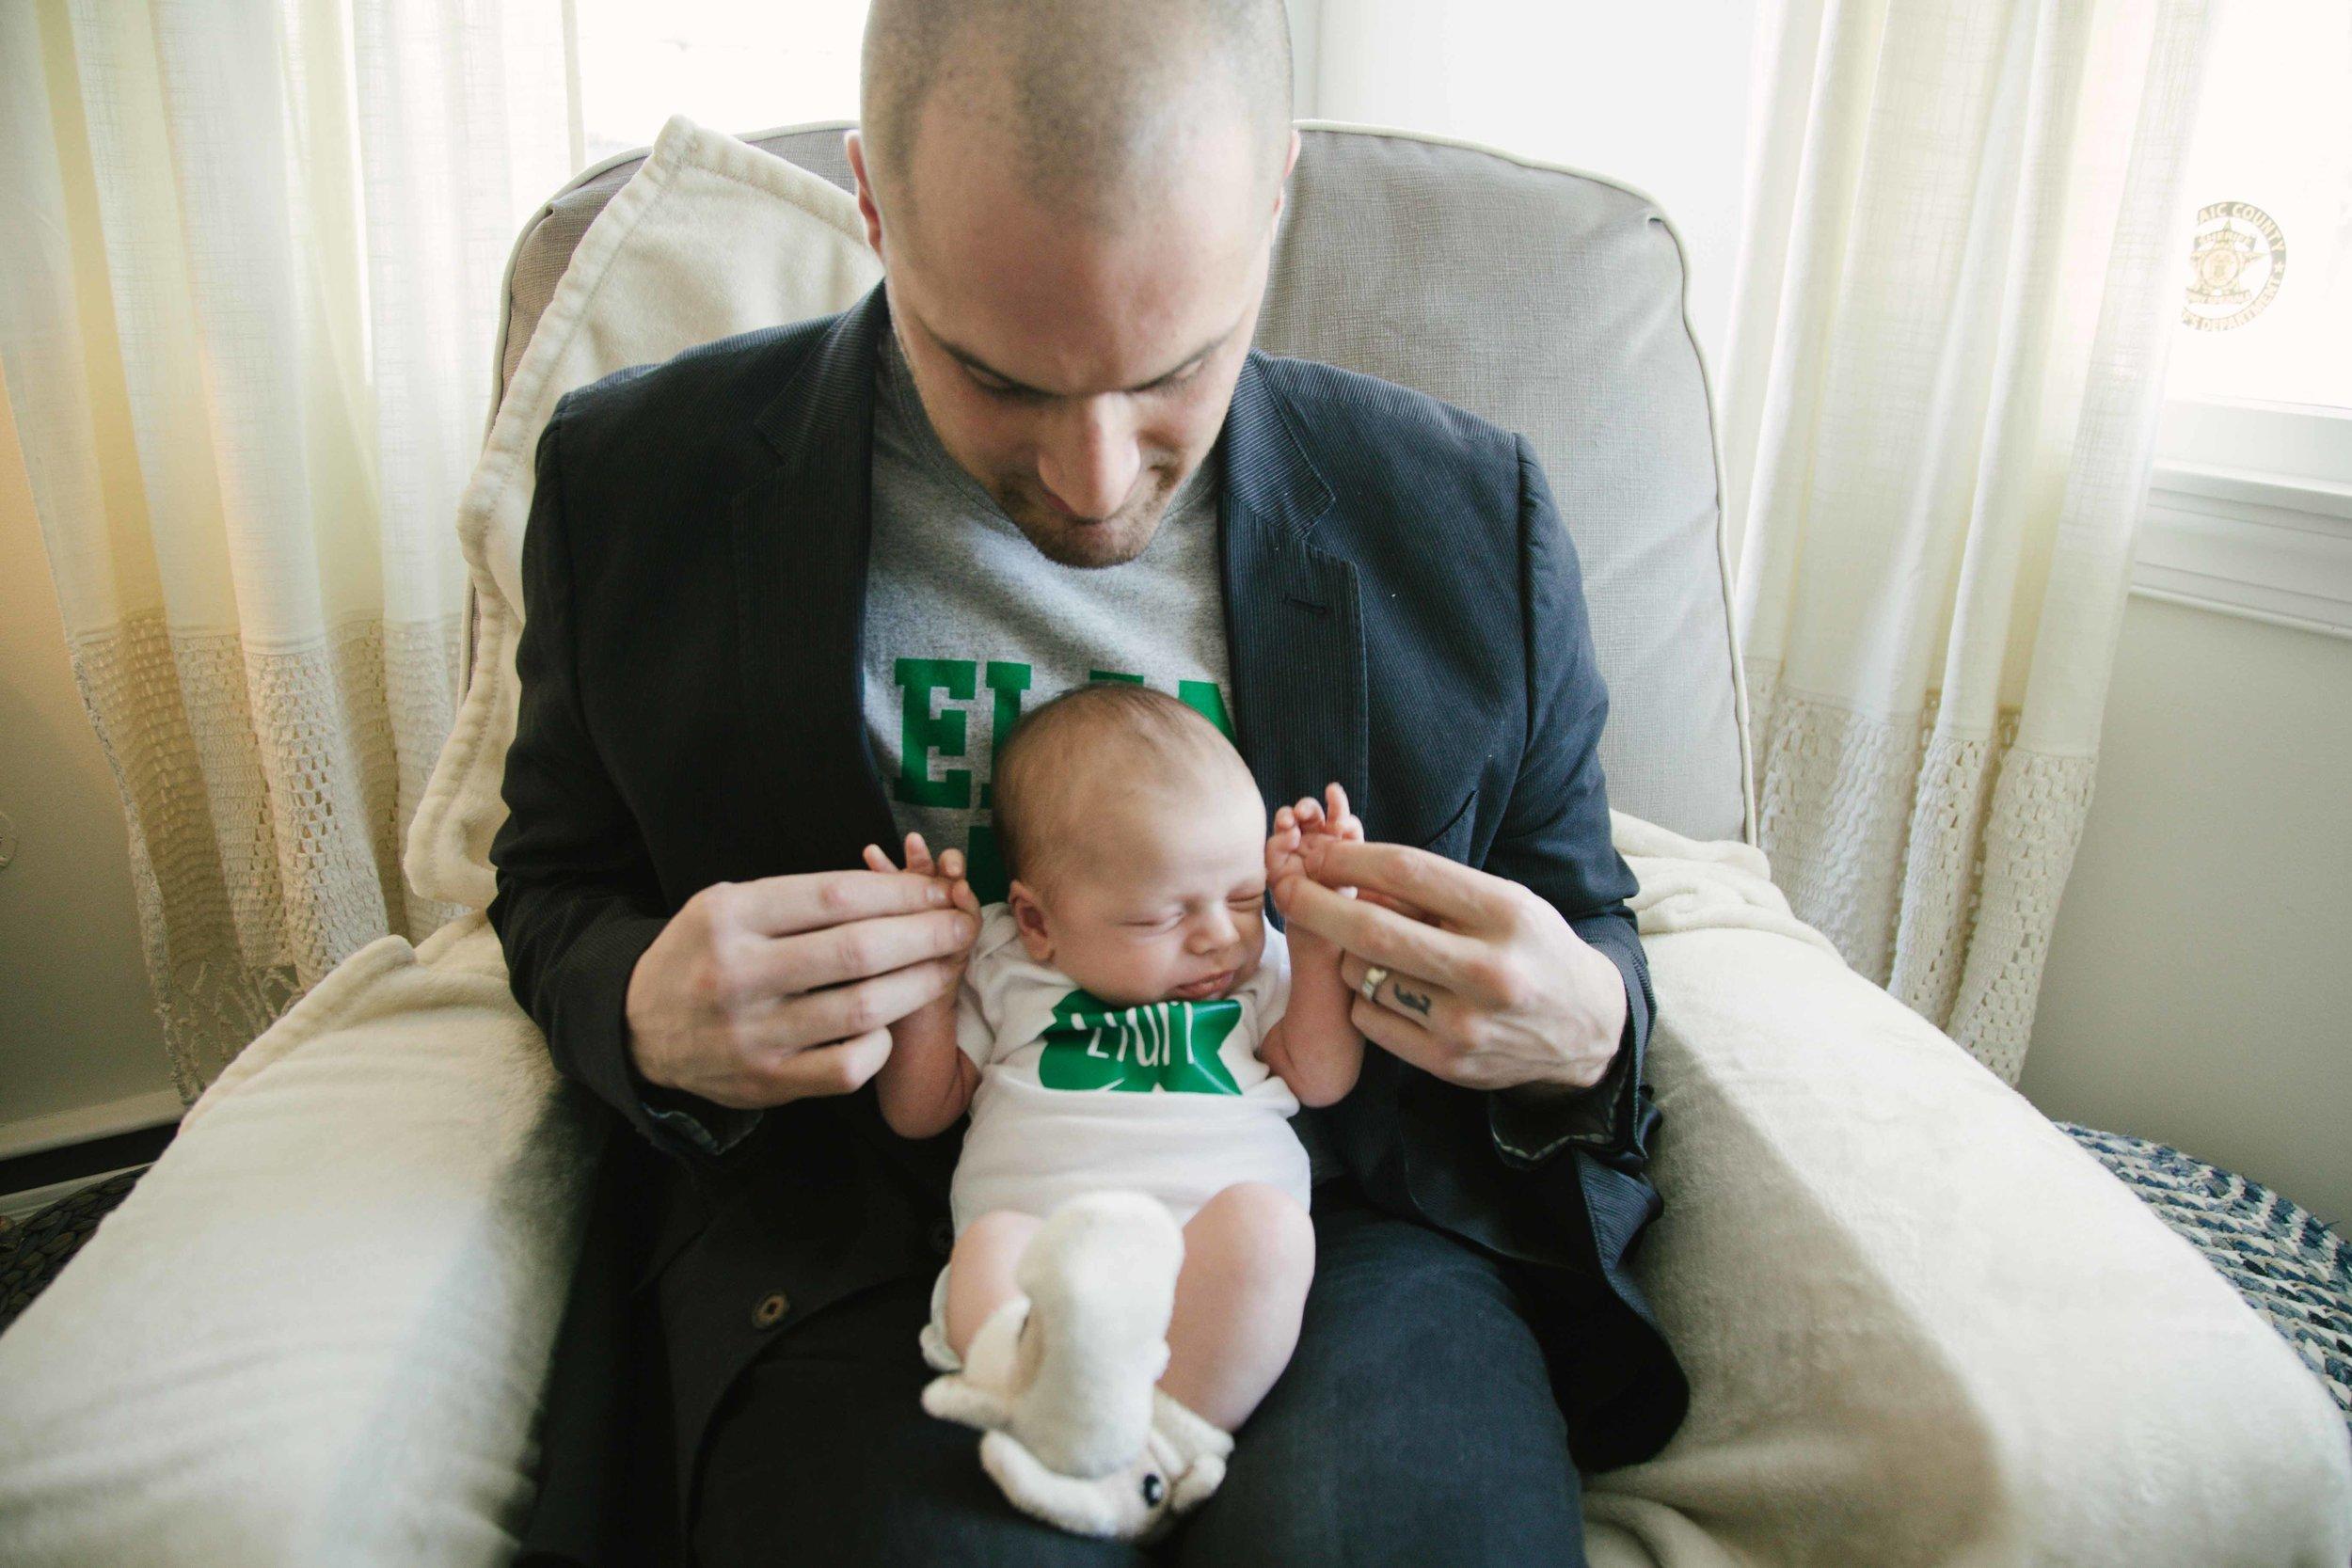 Wayne NJ newborn photo by Dan Schenker